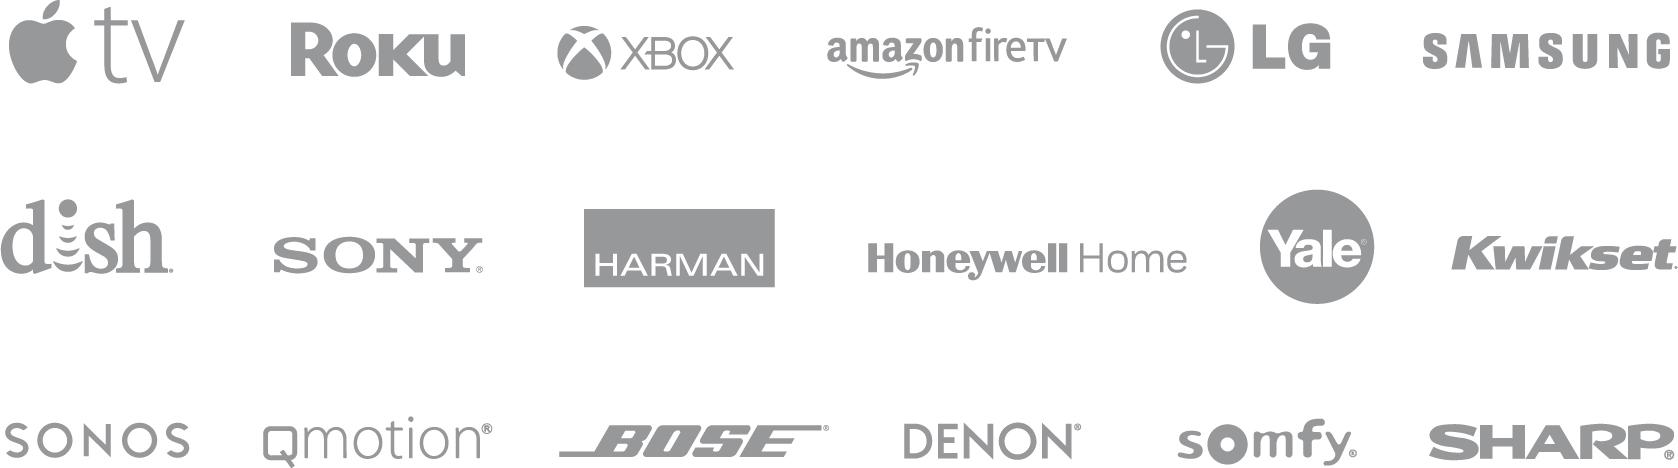 Apple TV, Roku, Amazon, Lutron, LG, Samsung, Dish, Sony, Bose, Denon, Yale, Kwikset, Sonos, QMotion, Harman, Honeywell, Somfy, Sharp